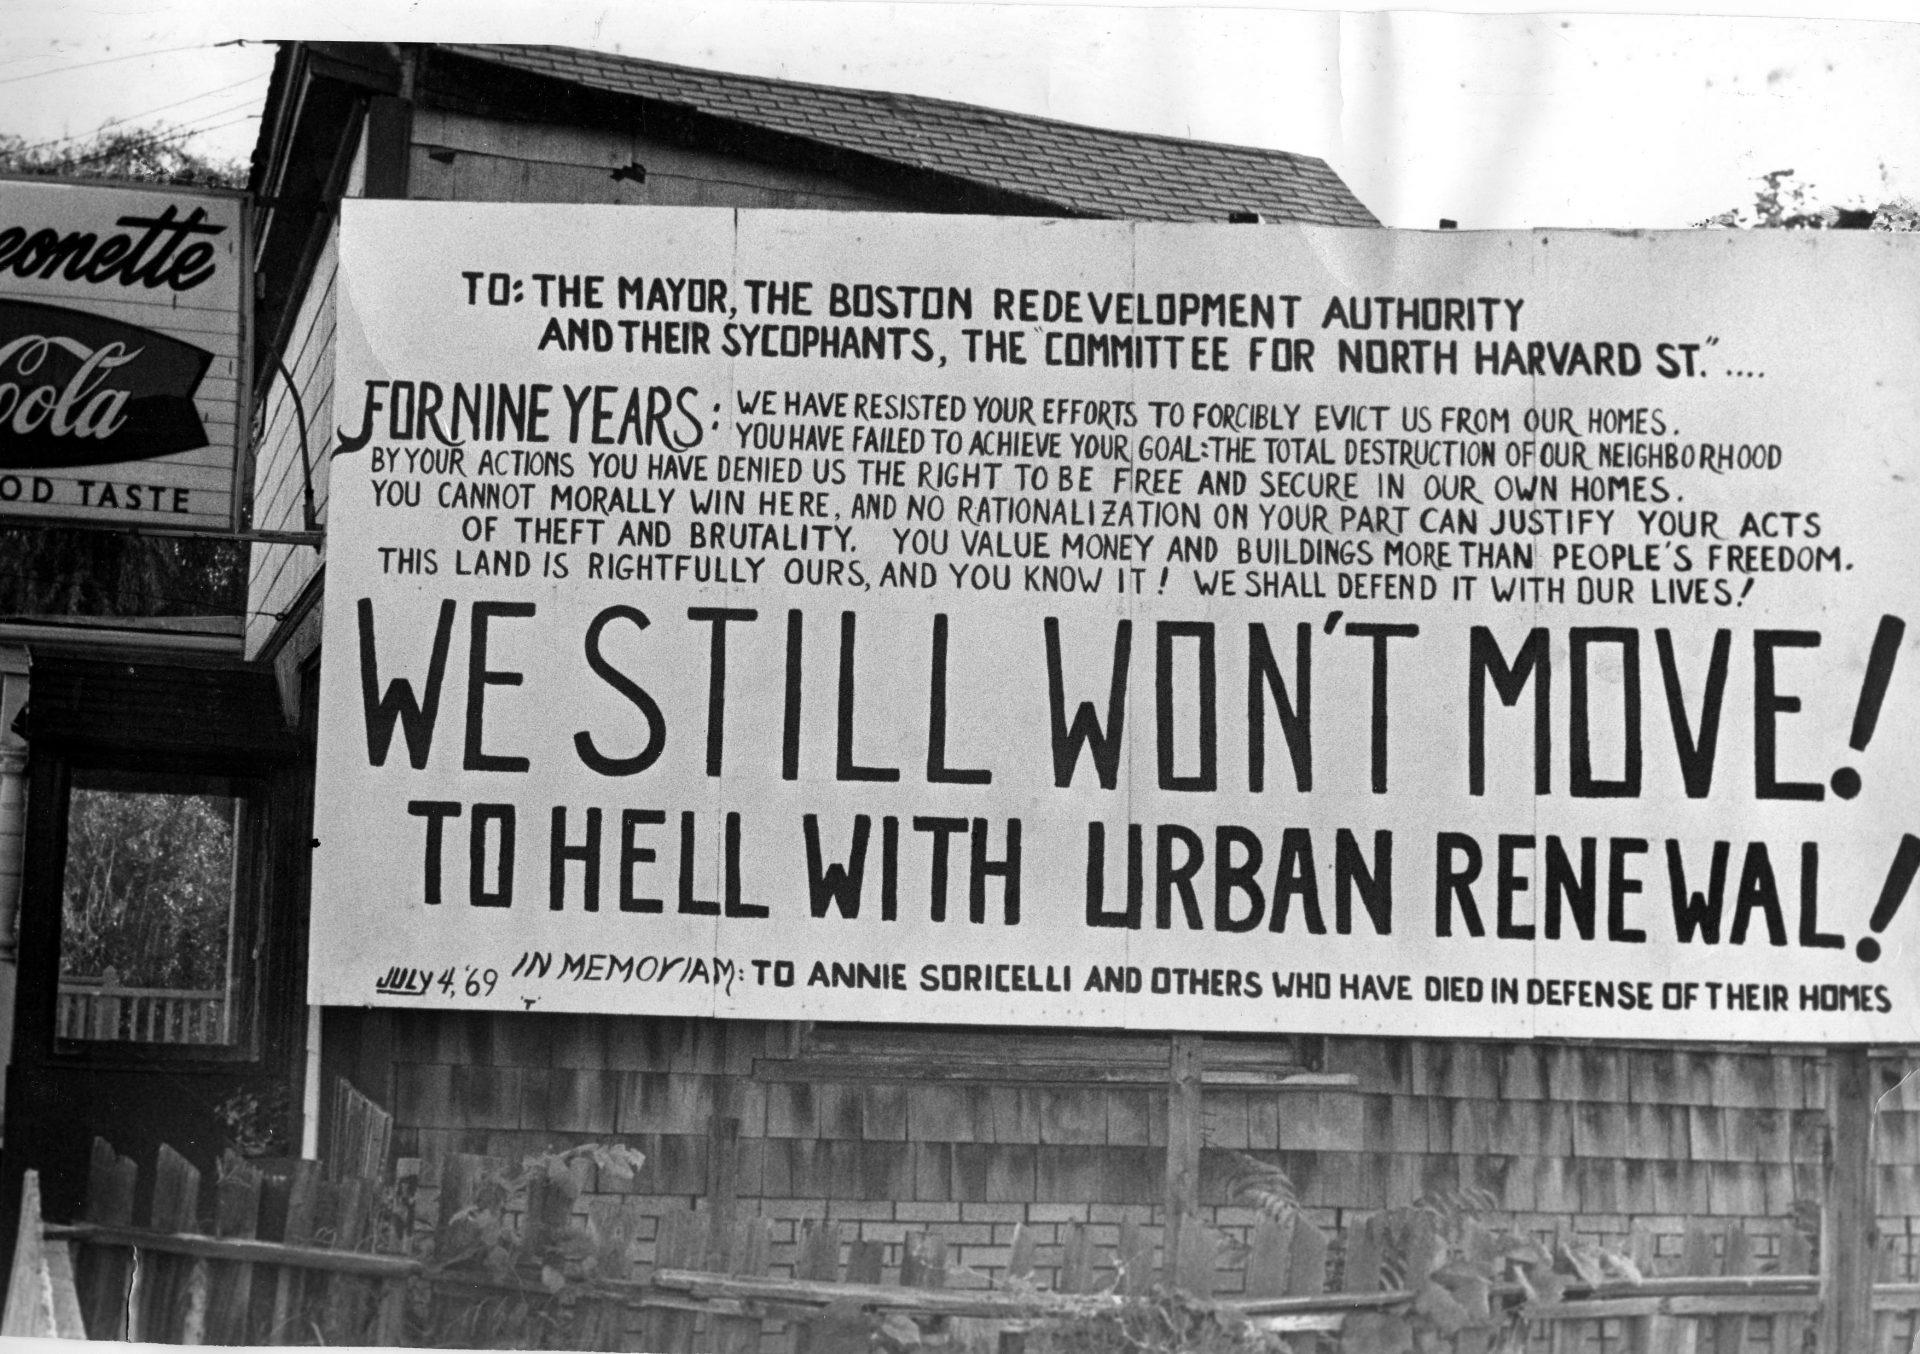 BarrysCorner 1969 Sign